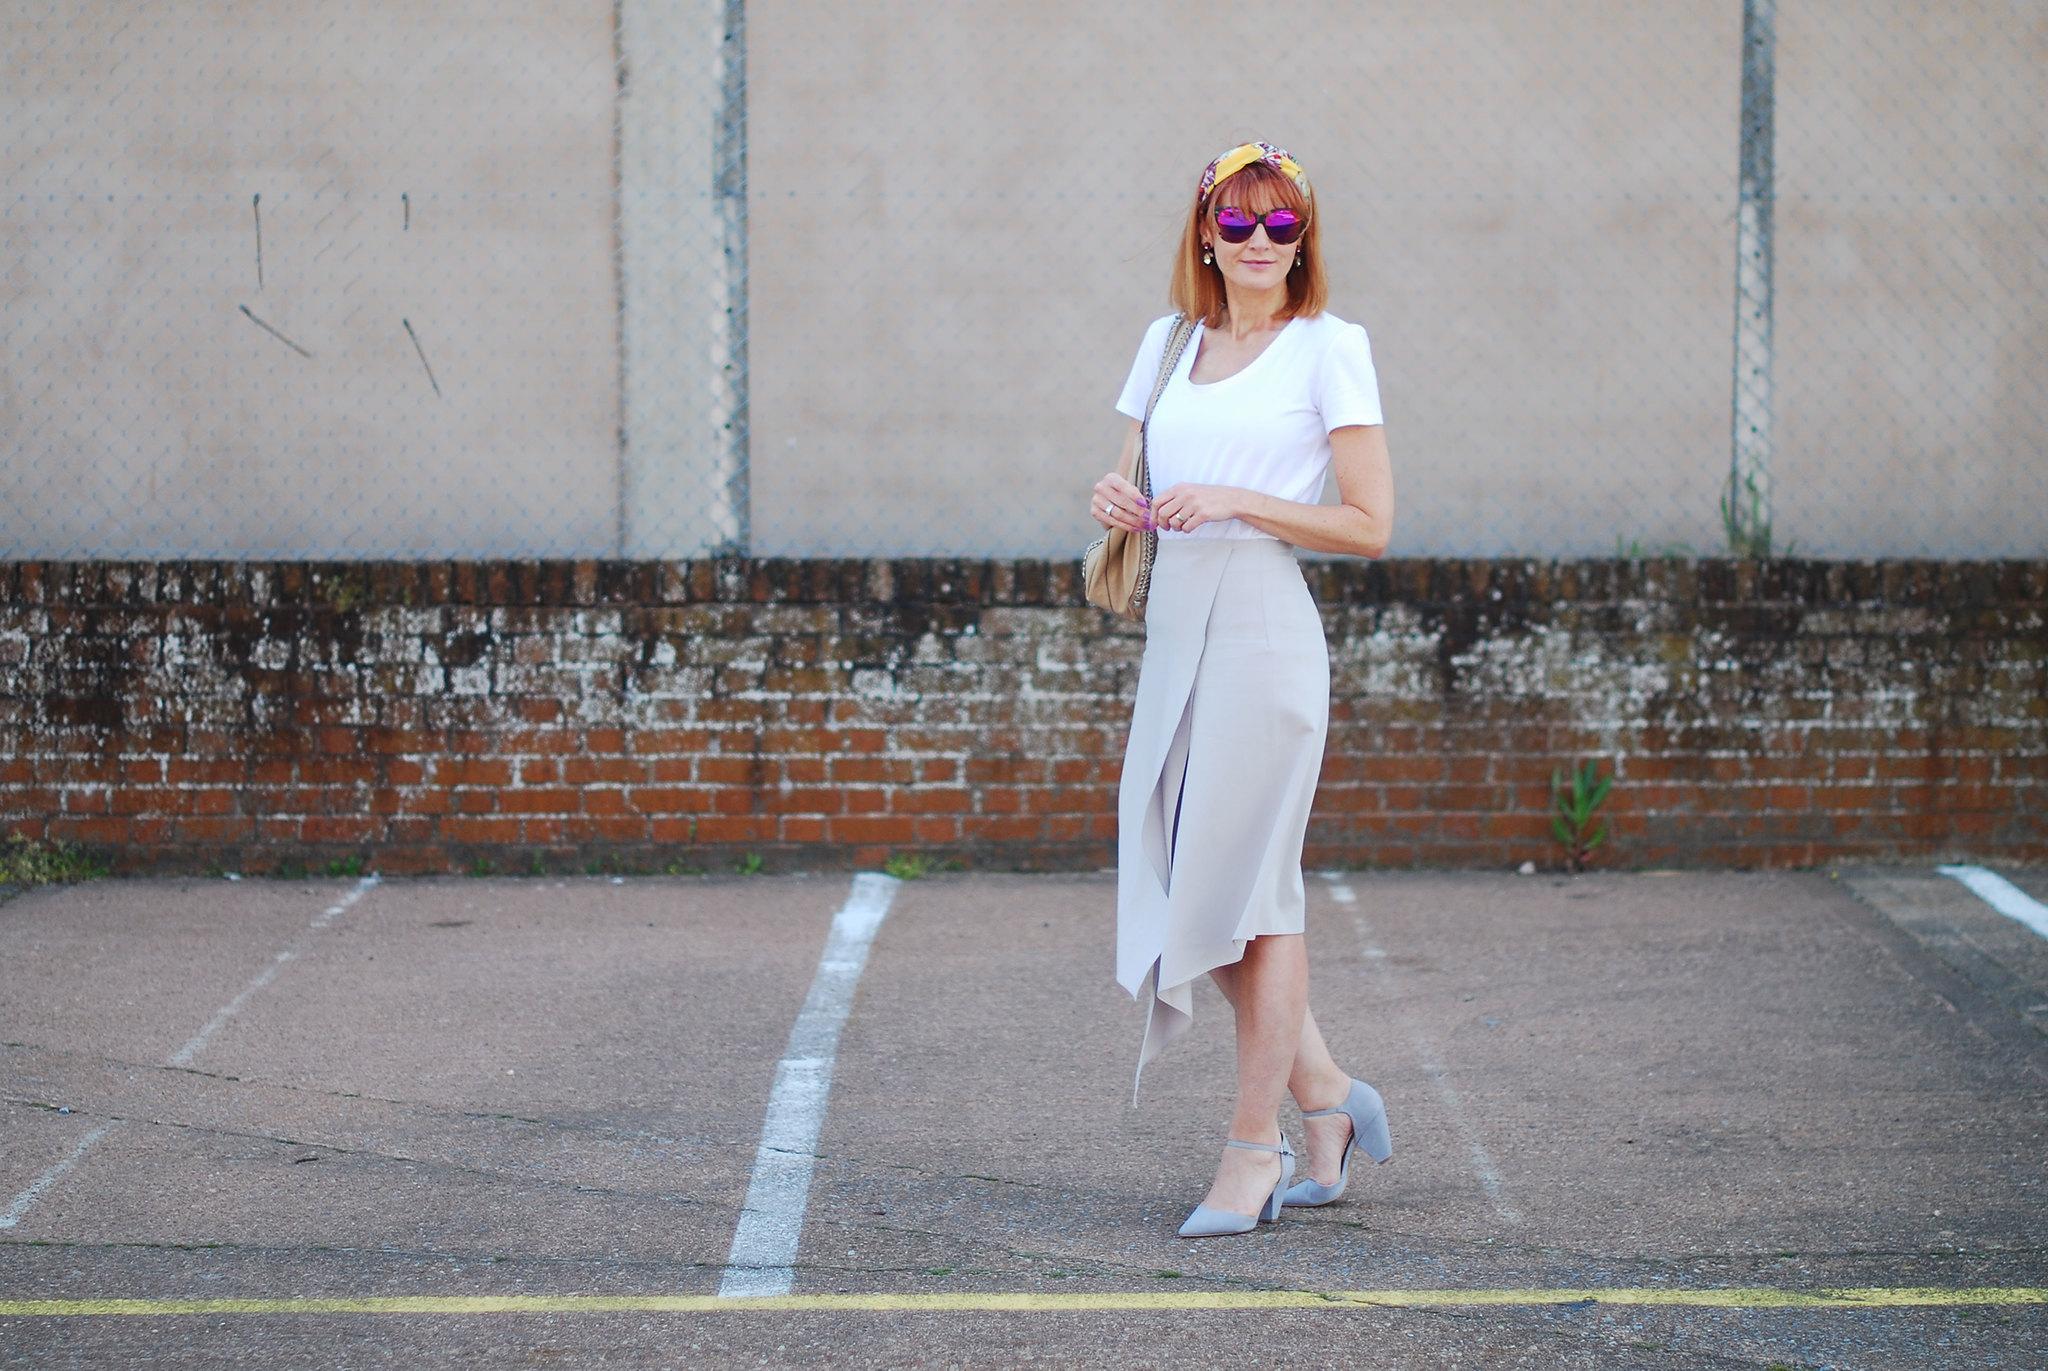 Ladylike Spring/Summer look: Plain white tee, pastel grey assymetric hem midi skirt, grey strappy heels, headscarf | Not Dressed As Lamb